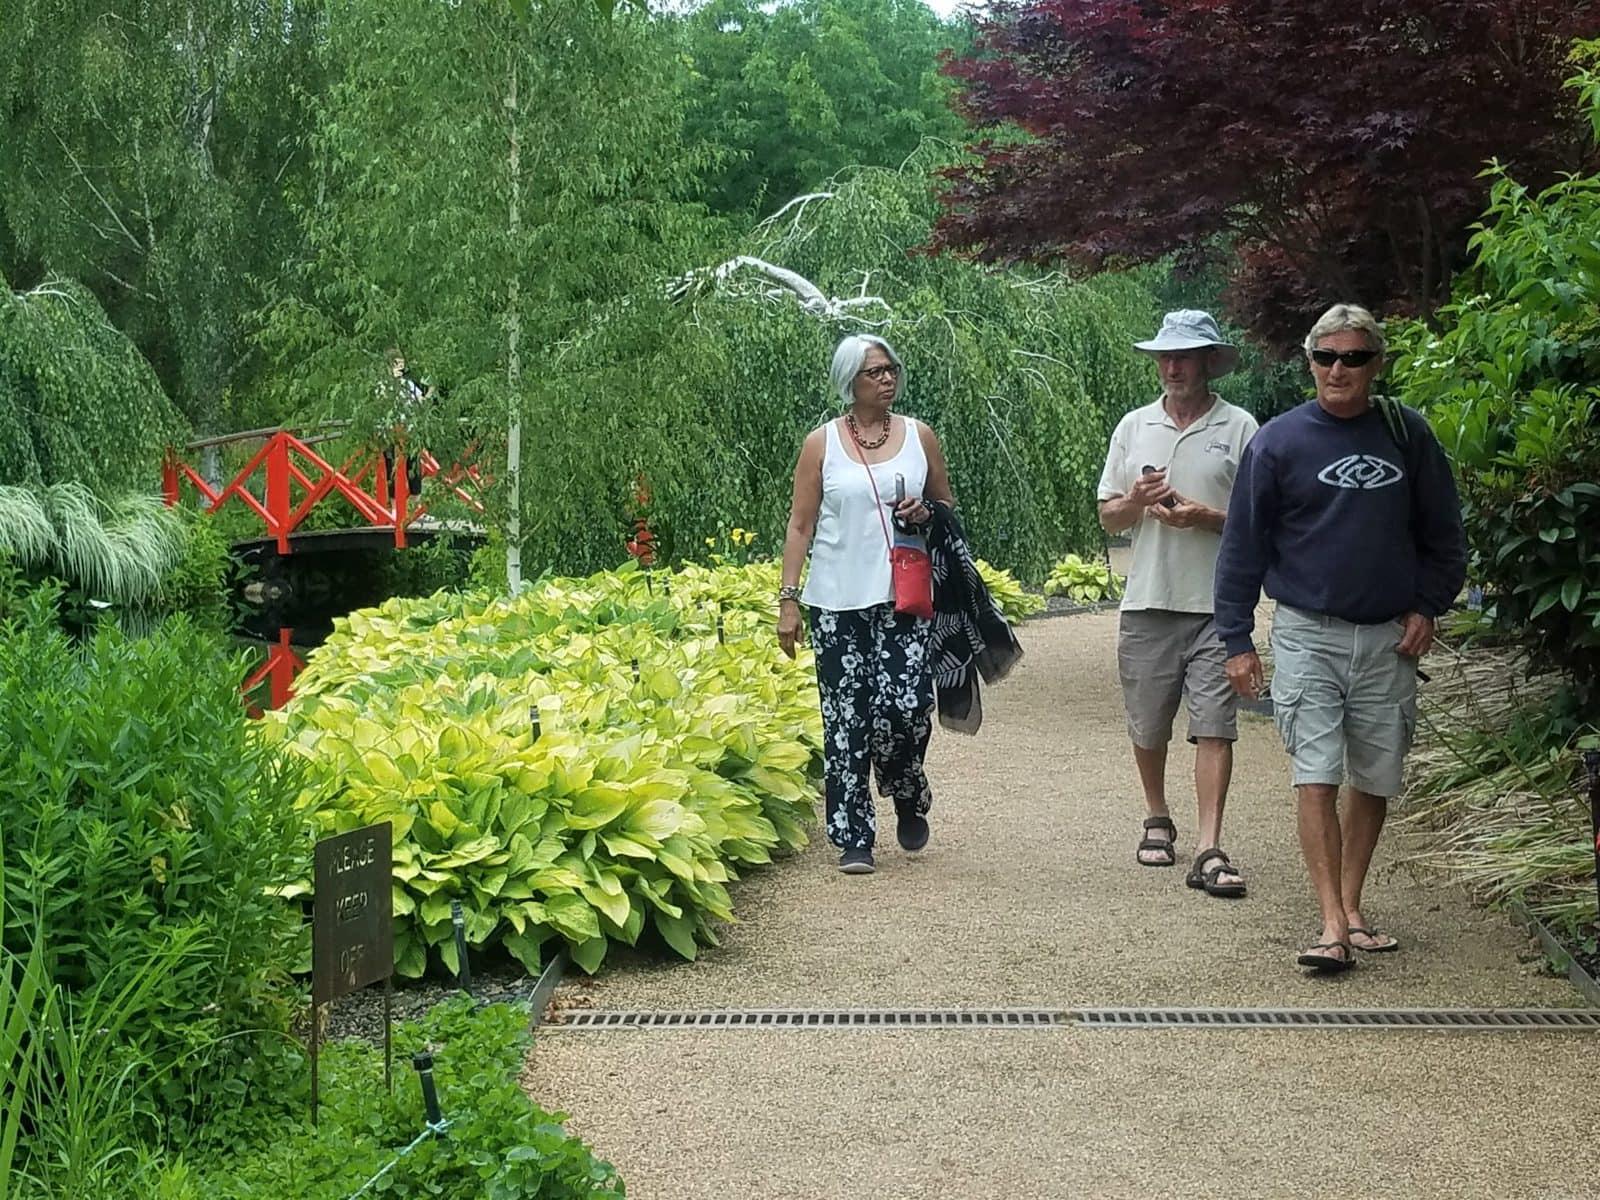 three people walking on path in lush garden with small bridge behind